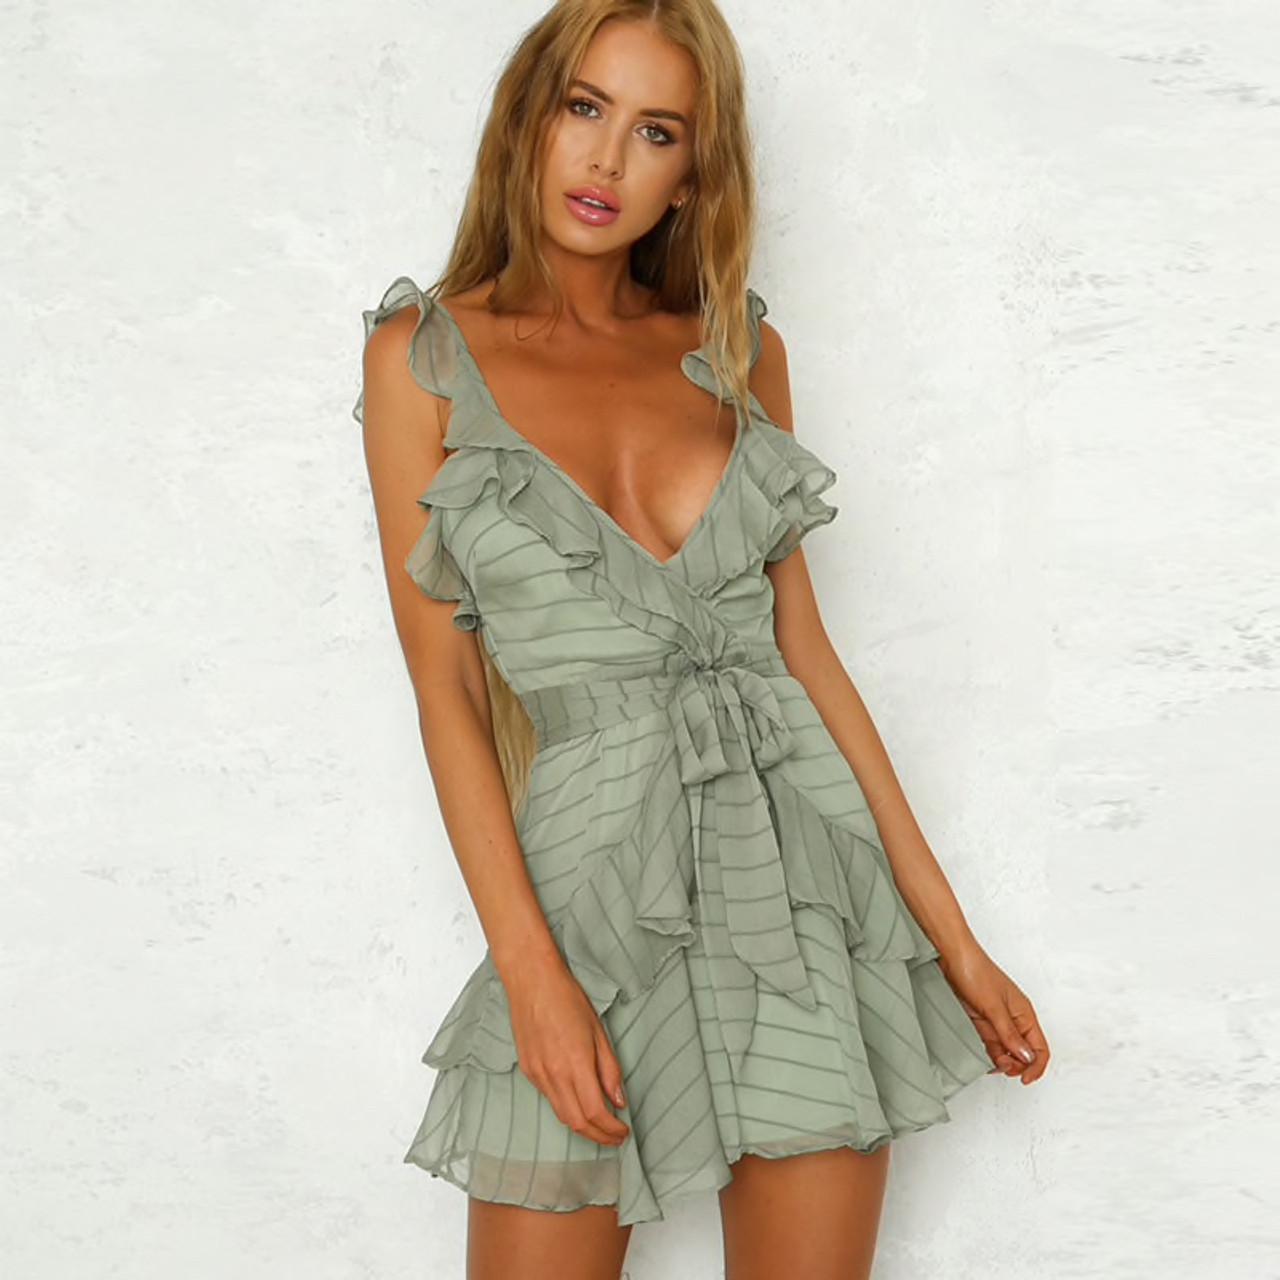 6f793f76cc0 Summer-Dress-2018-Frill-Ruffle-Beach-Dress-Women-Sleeveless-Deep-V-Neck-Sexy -Backless-Tie-Mini  36870.1551149555.jpg c 2 imbypass on